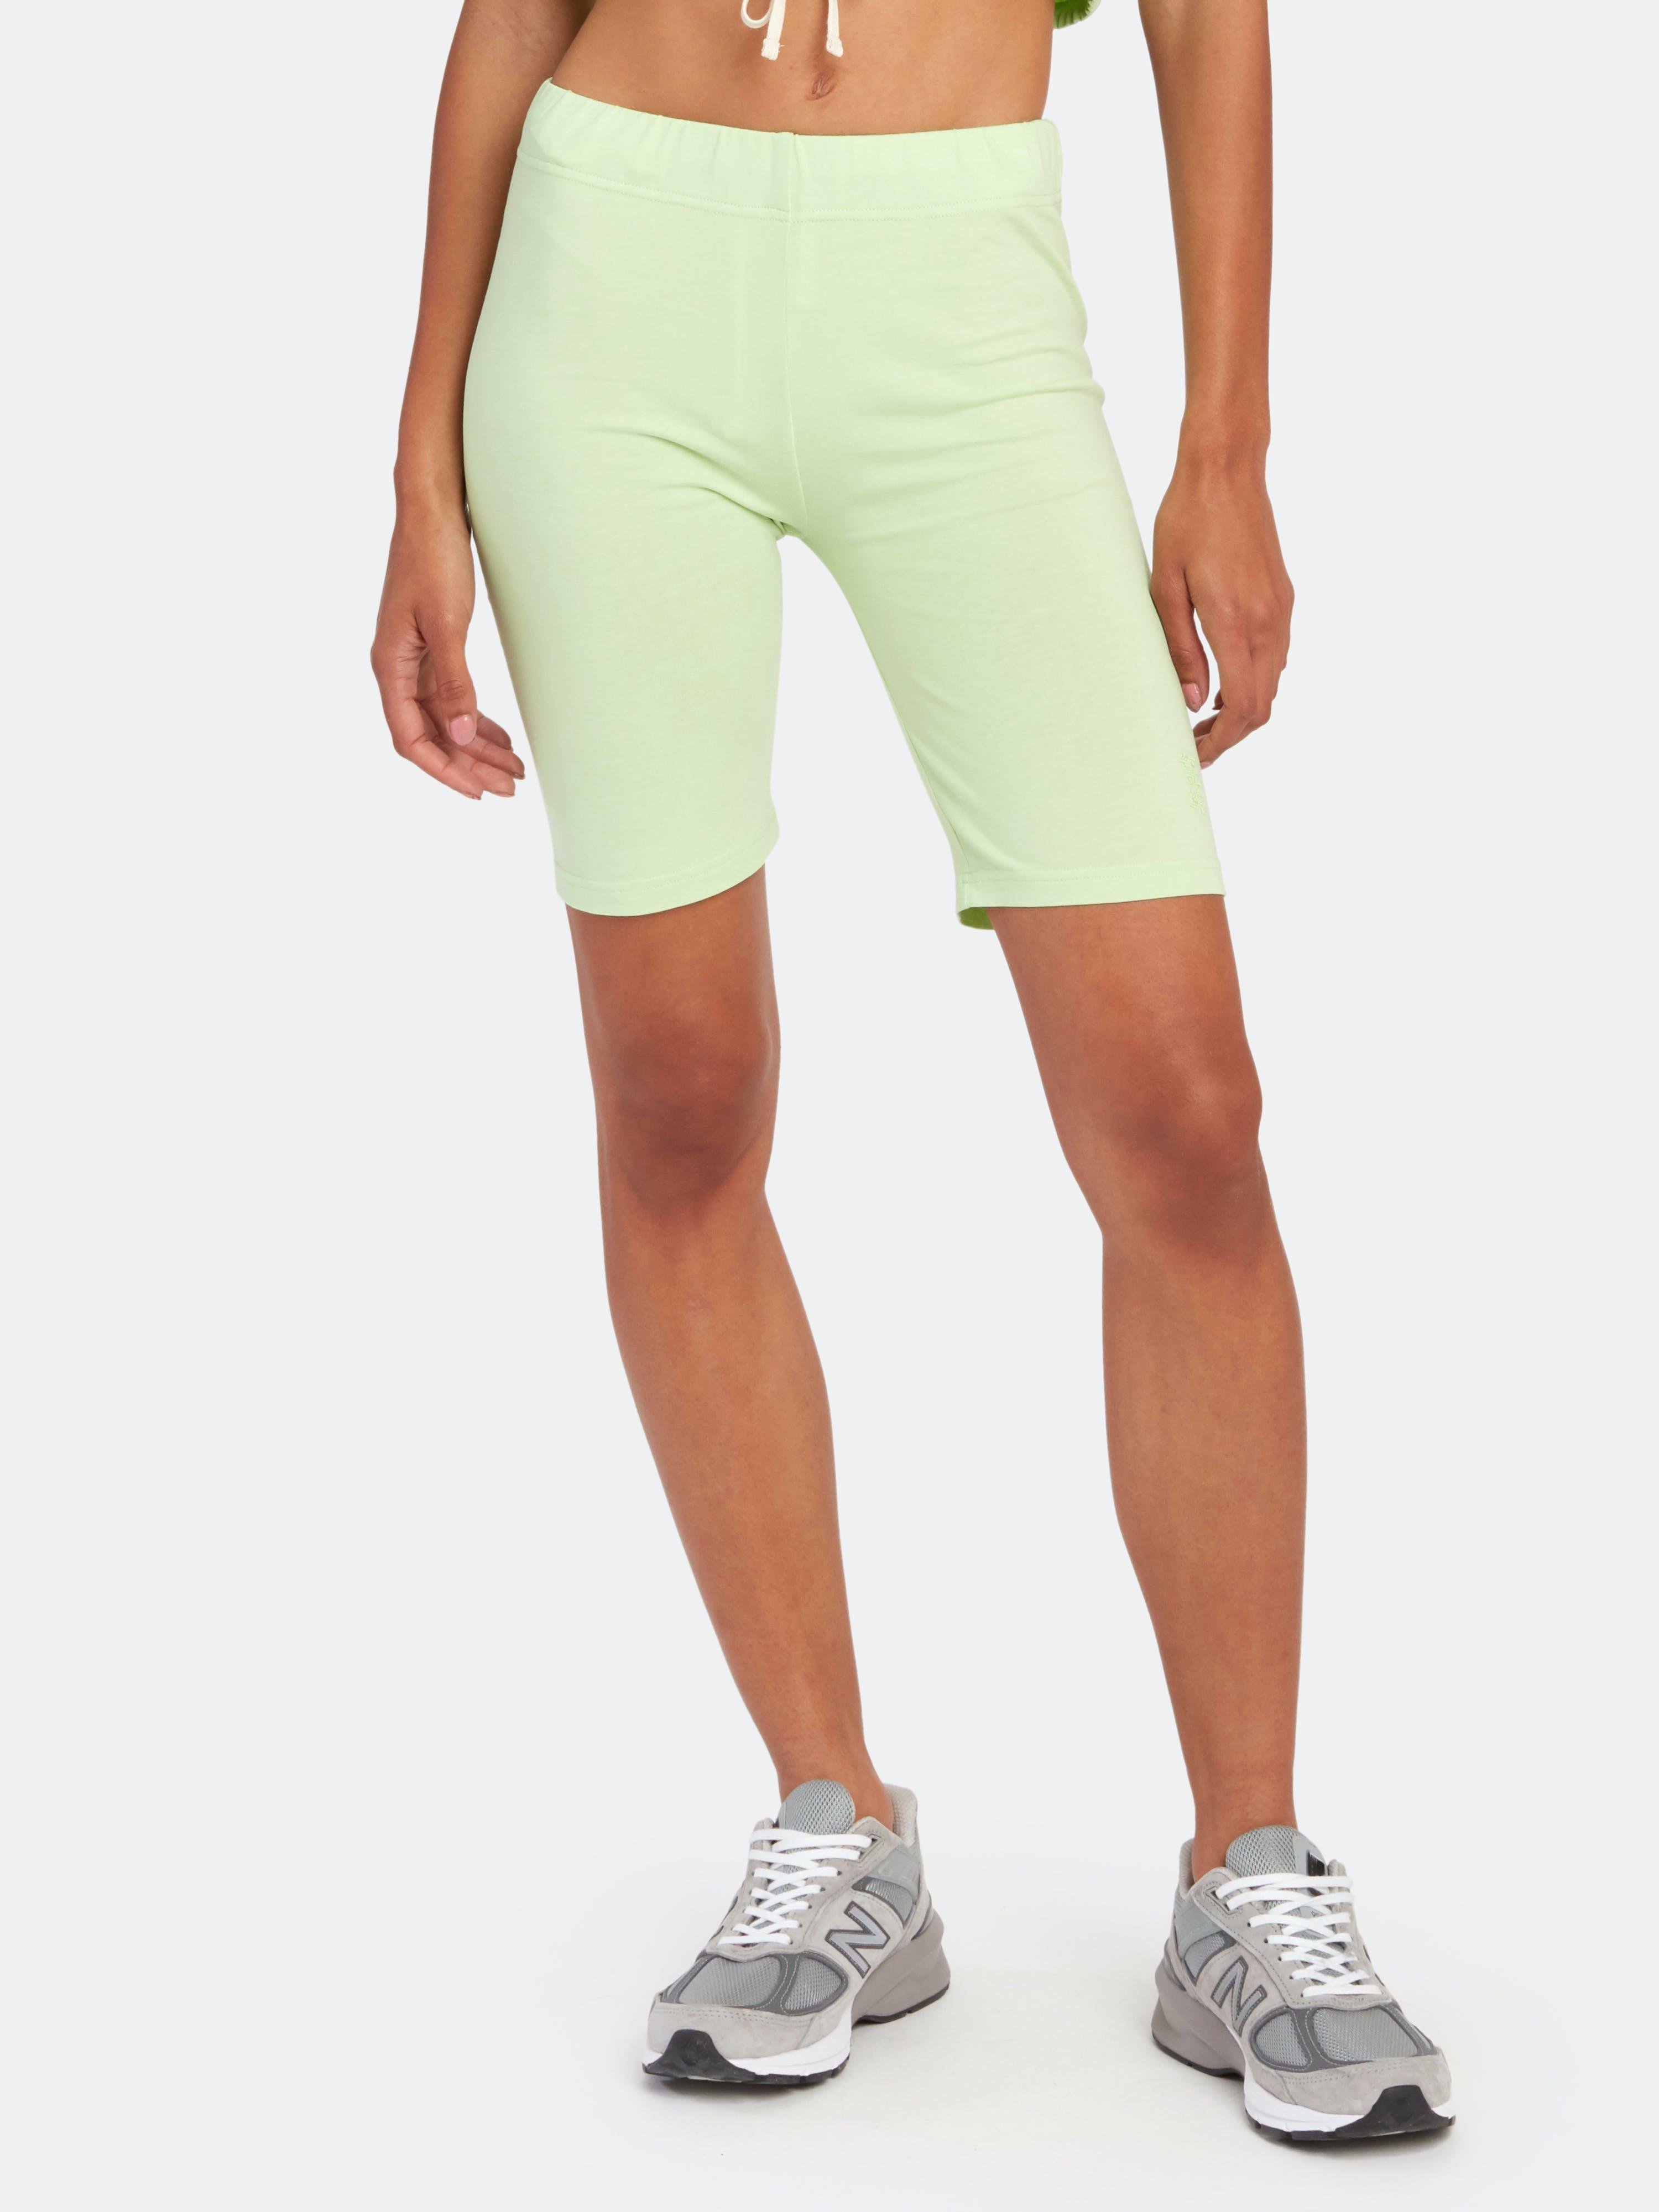 Les Girls Les Boys Tight Bike Shorts - XL - Also in: M, L, S, XS  - Green